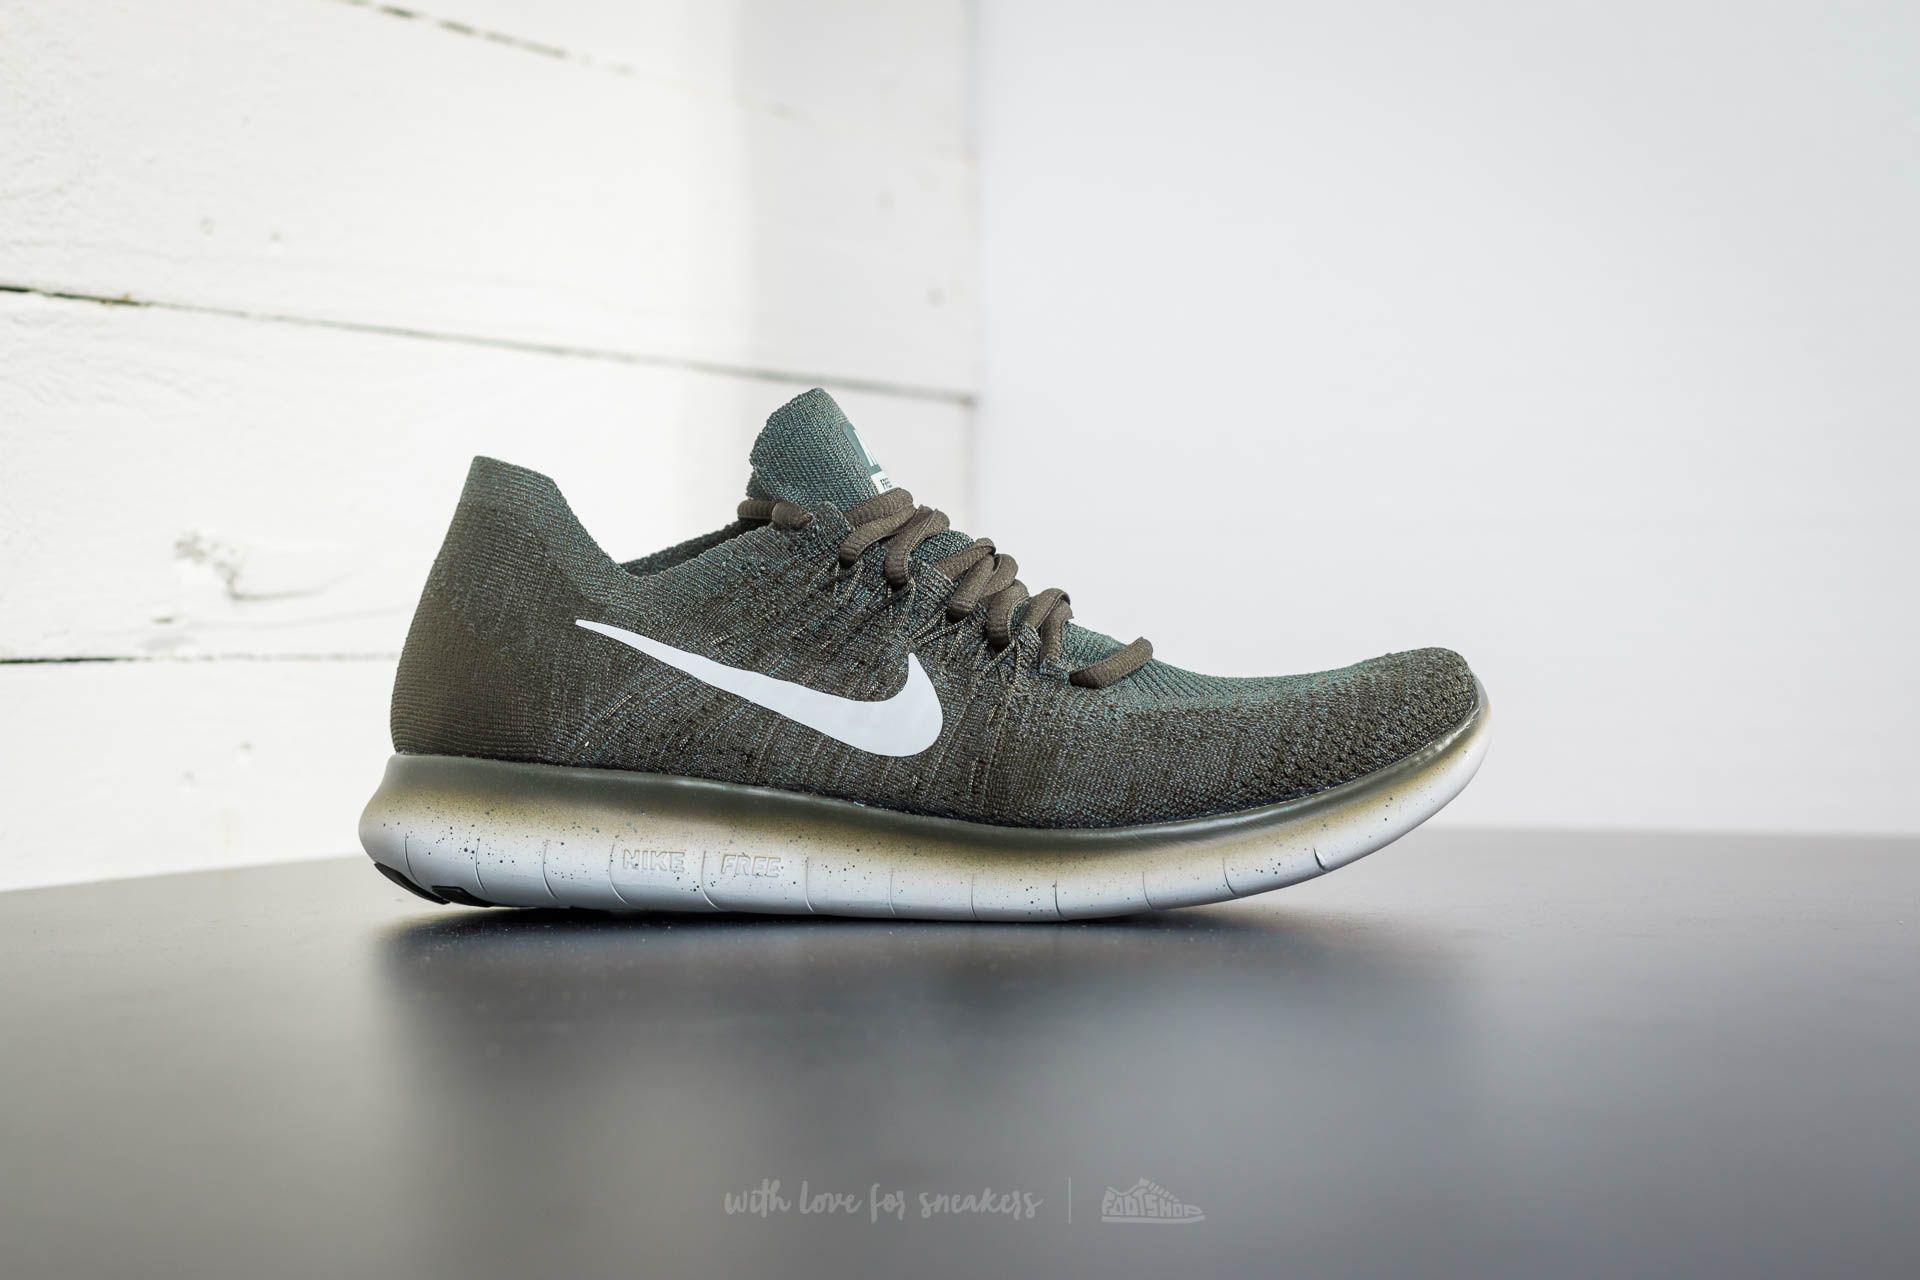 050e7311b811e Lyst - Nike Free Run Flyknit 2017 Vintage Green  Pure Platinum in ...